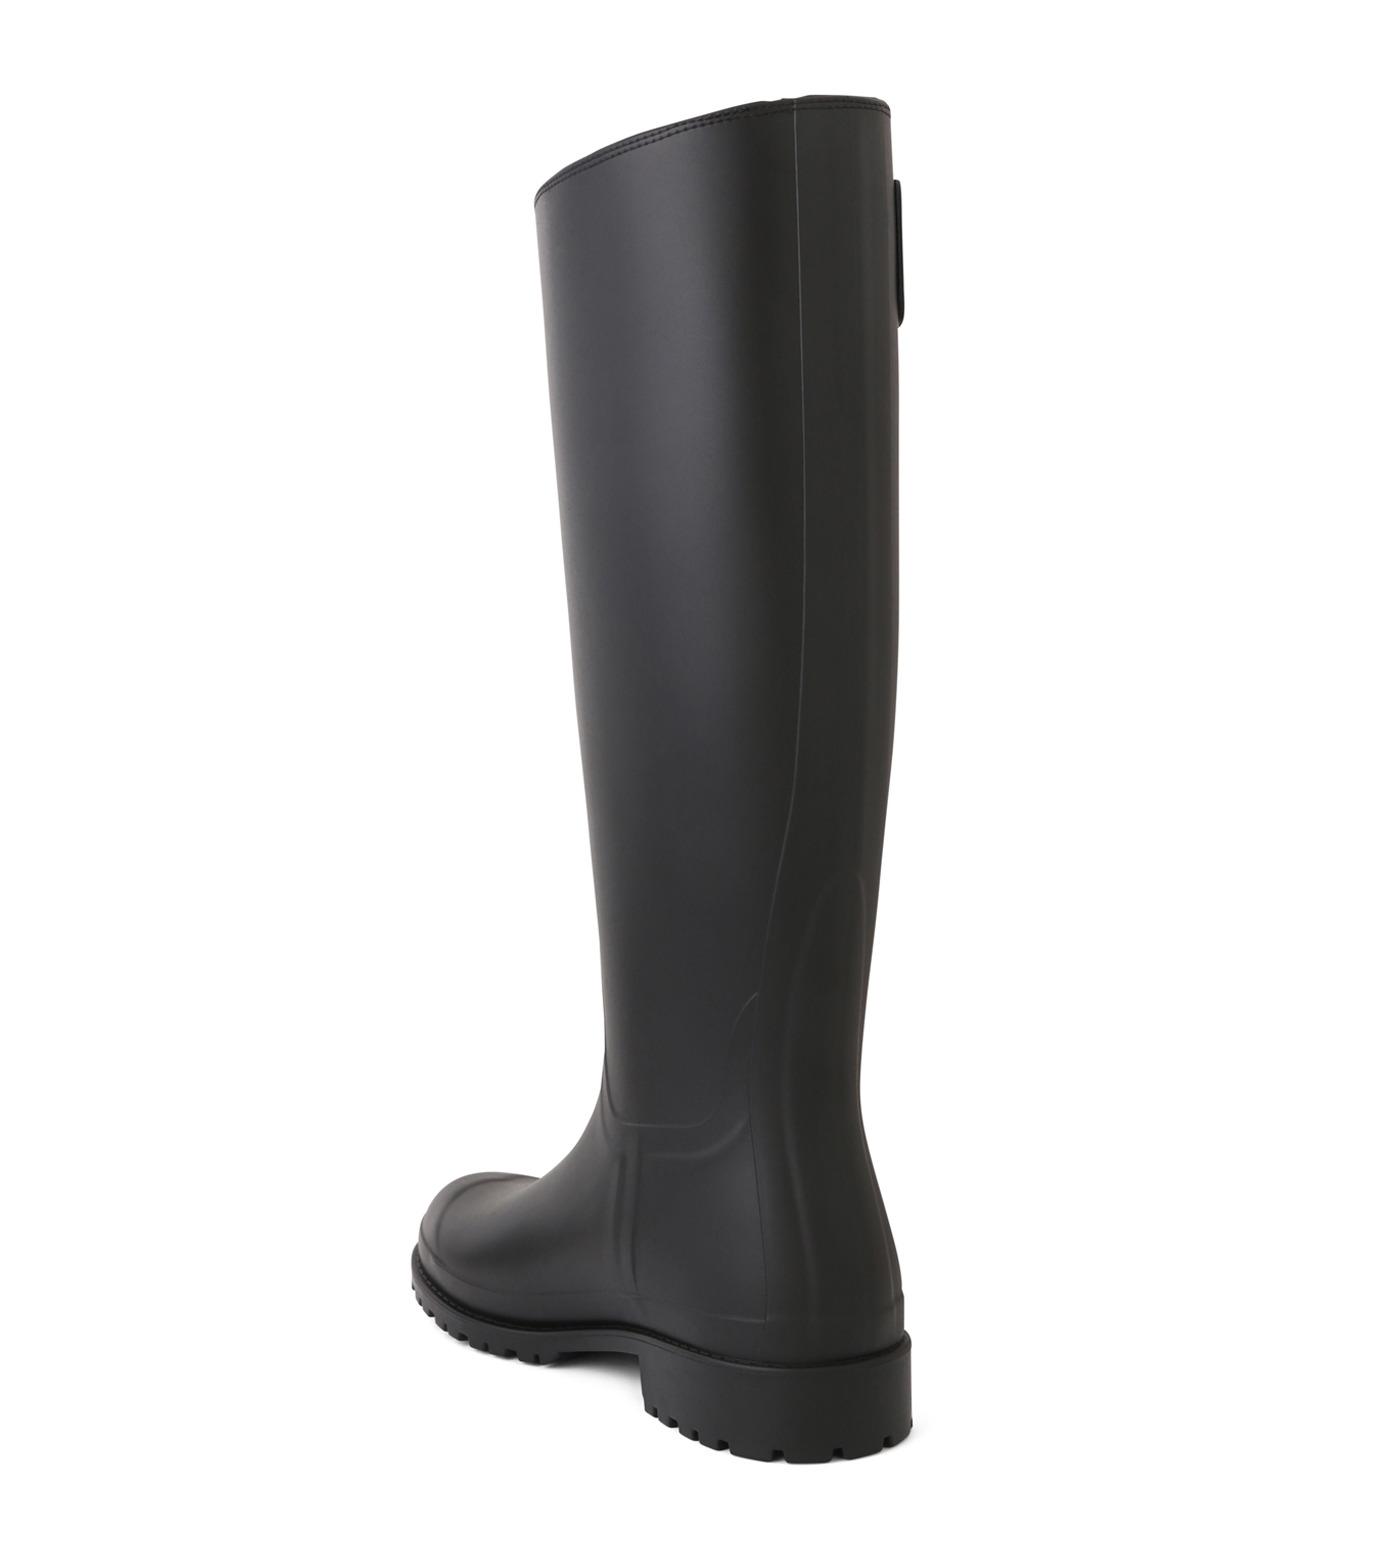 SAINT LAURENT(サンローラン)のRain Boots-BLACK(シューズ/shoes)-427315-GQN10-13 拡大詳細画像2